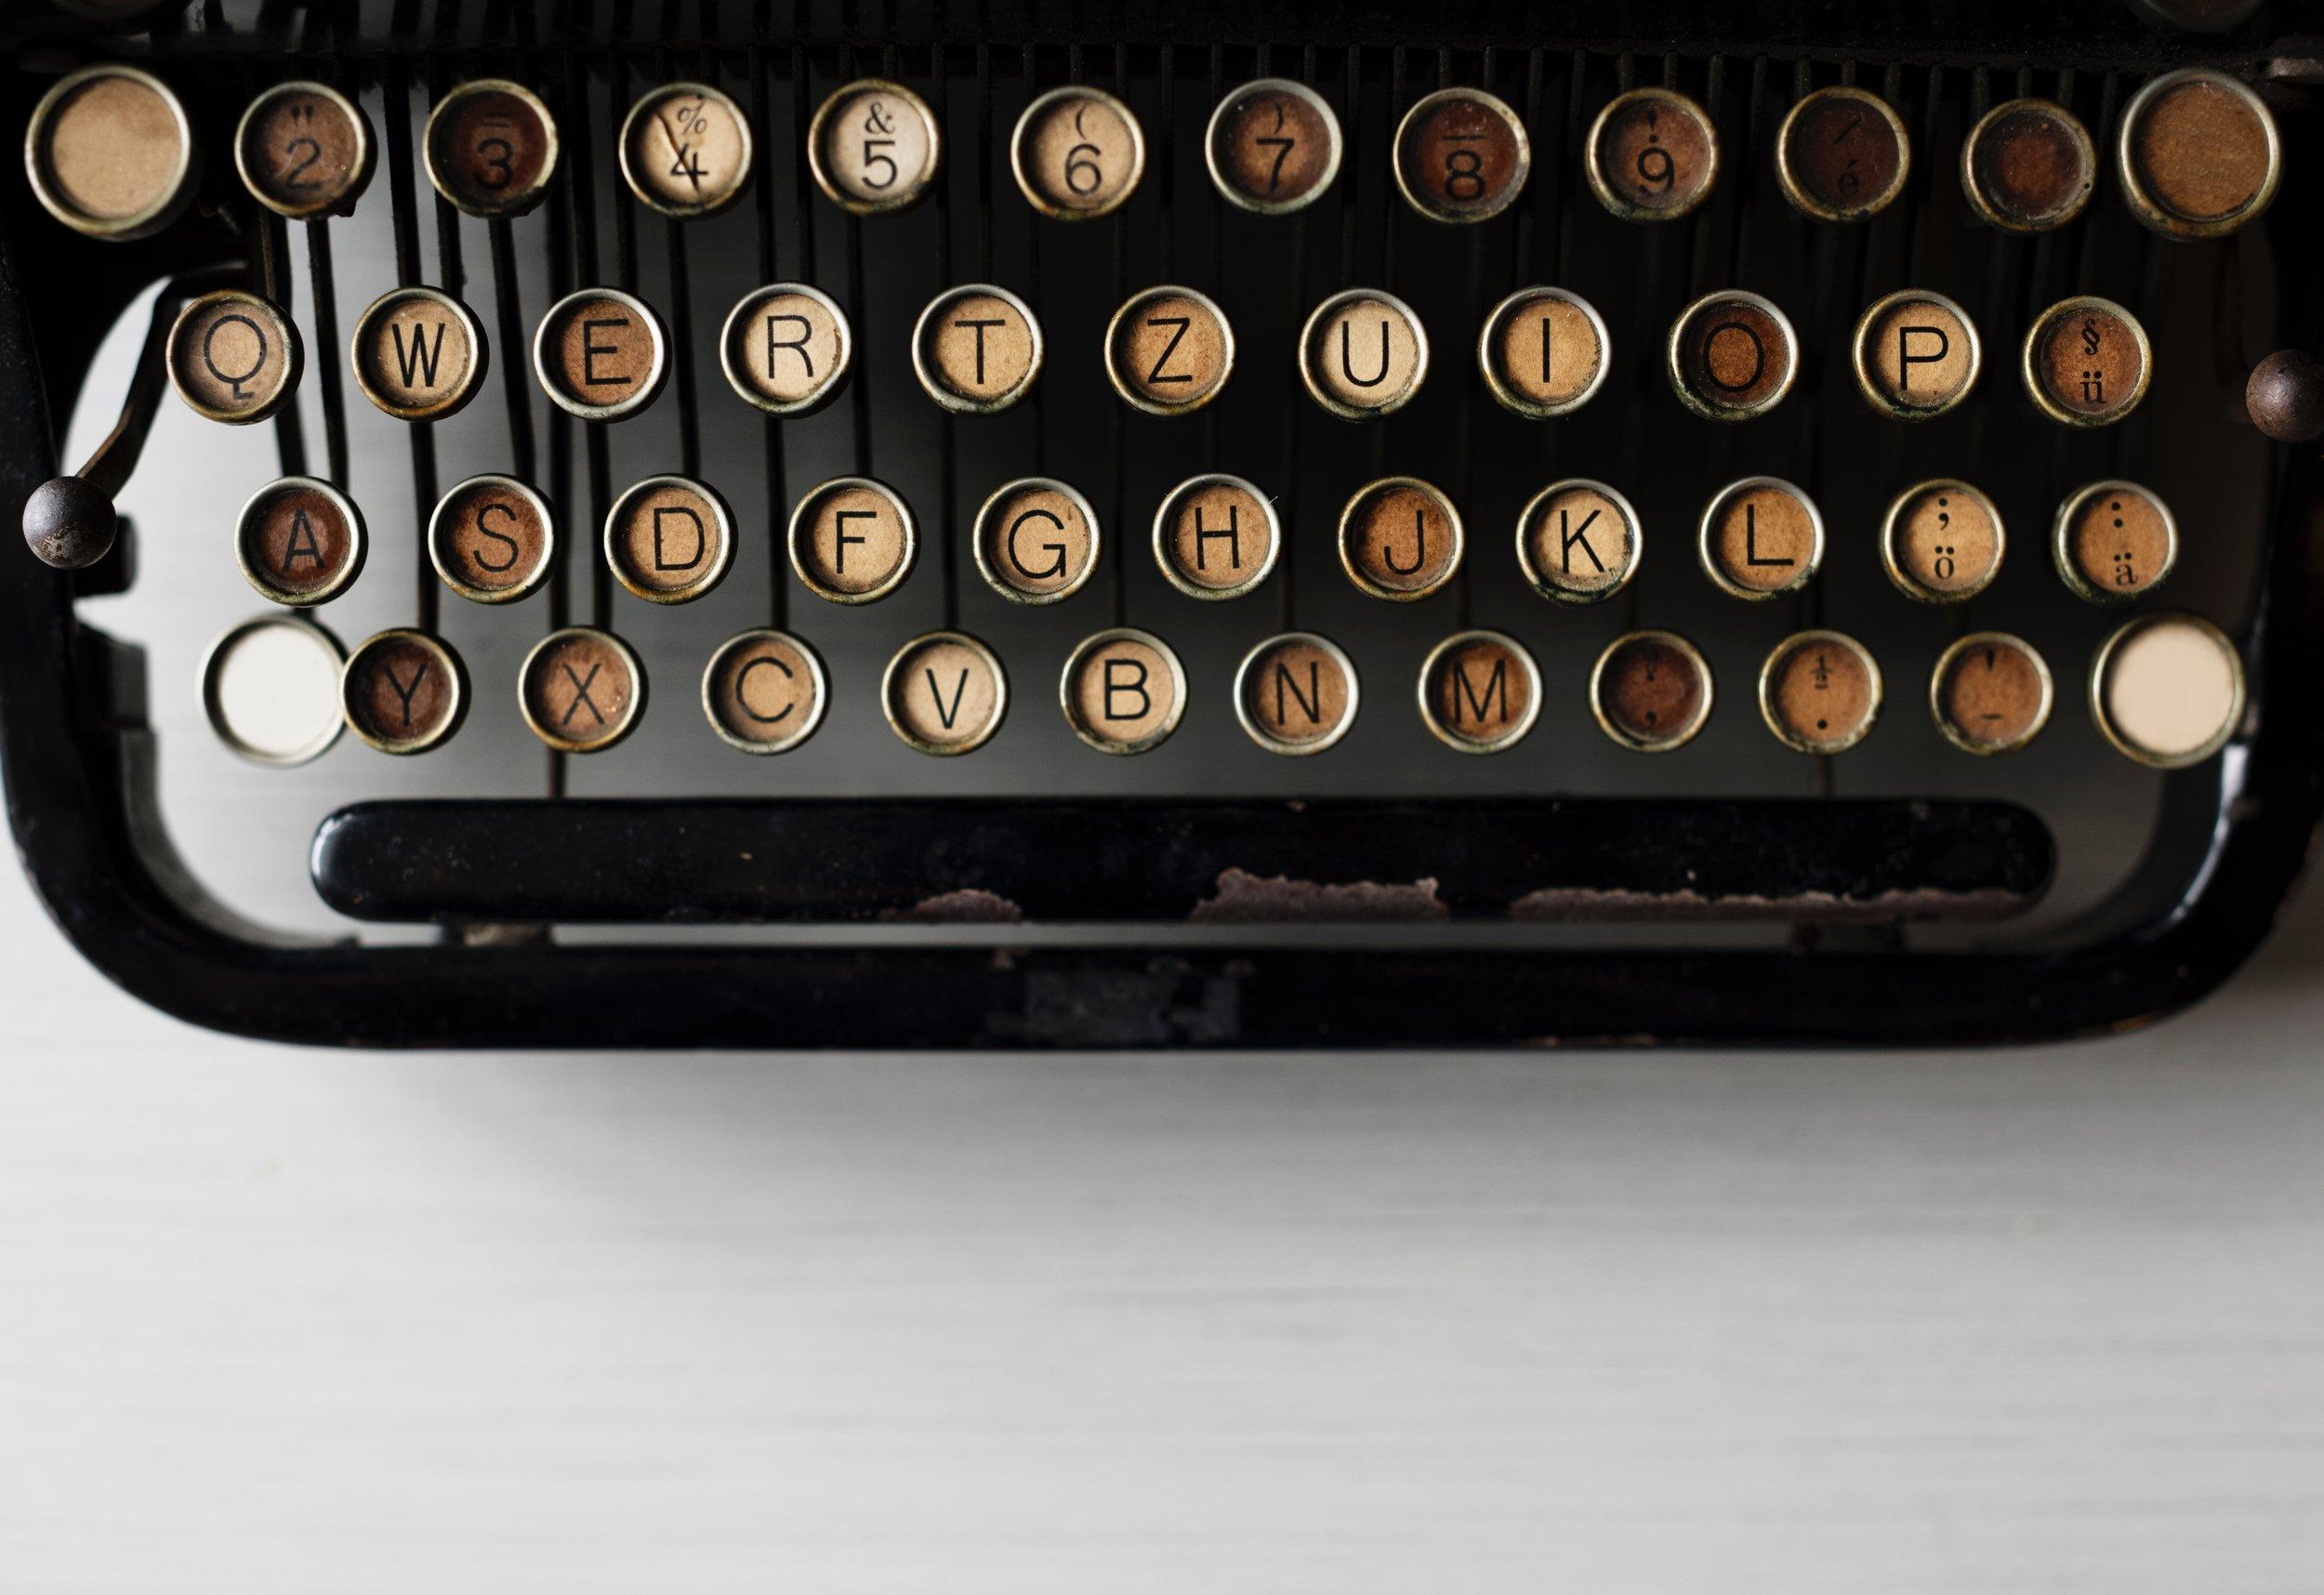 Photo by  rawpixel.com on  Unsplash